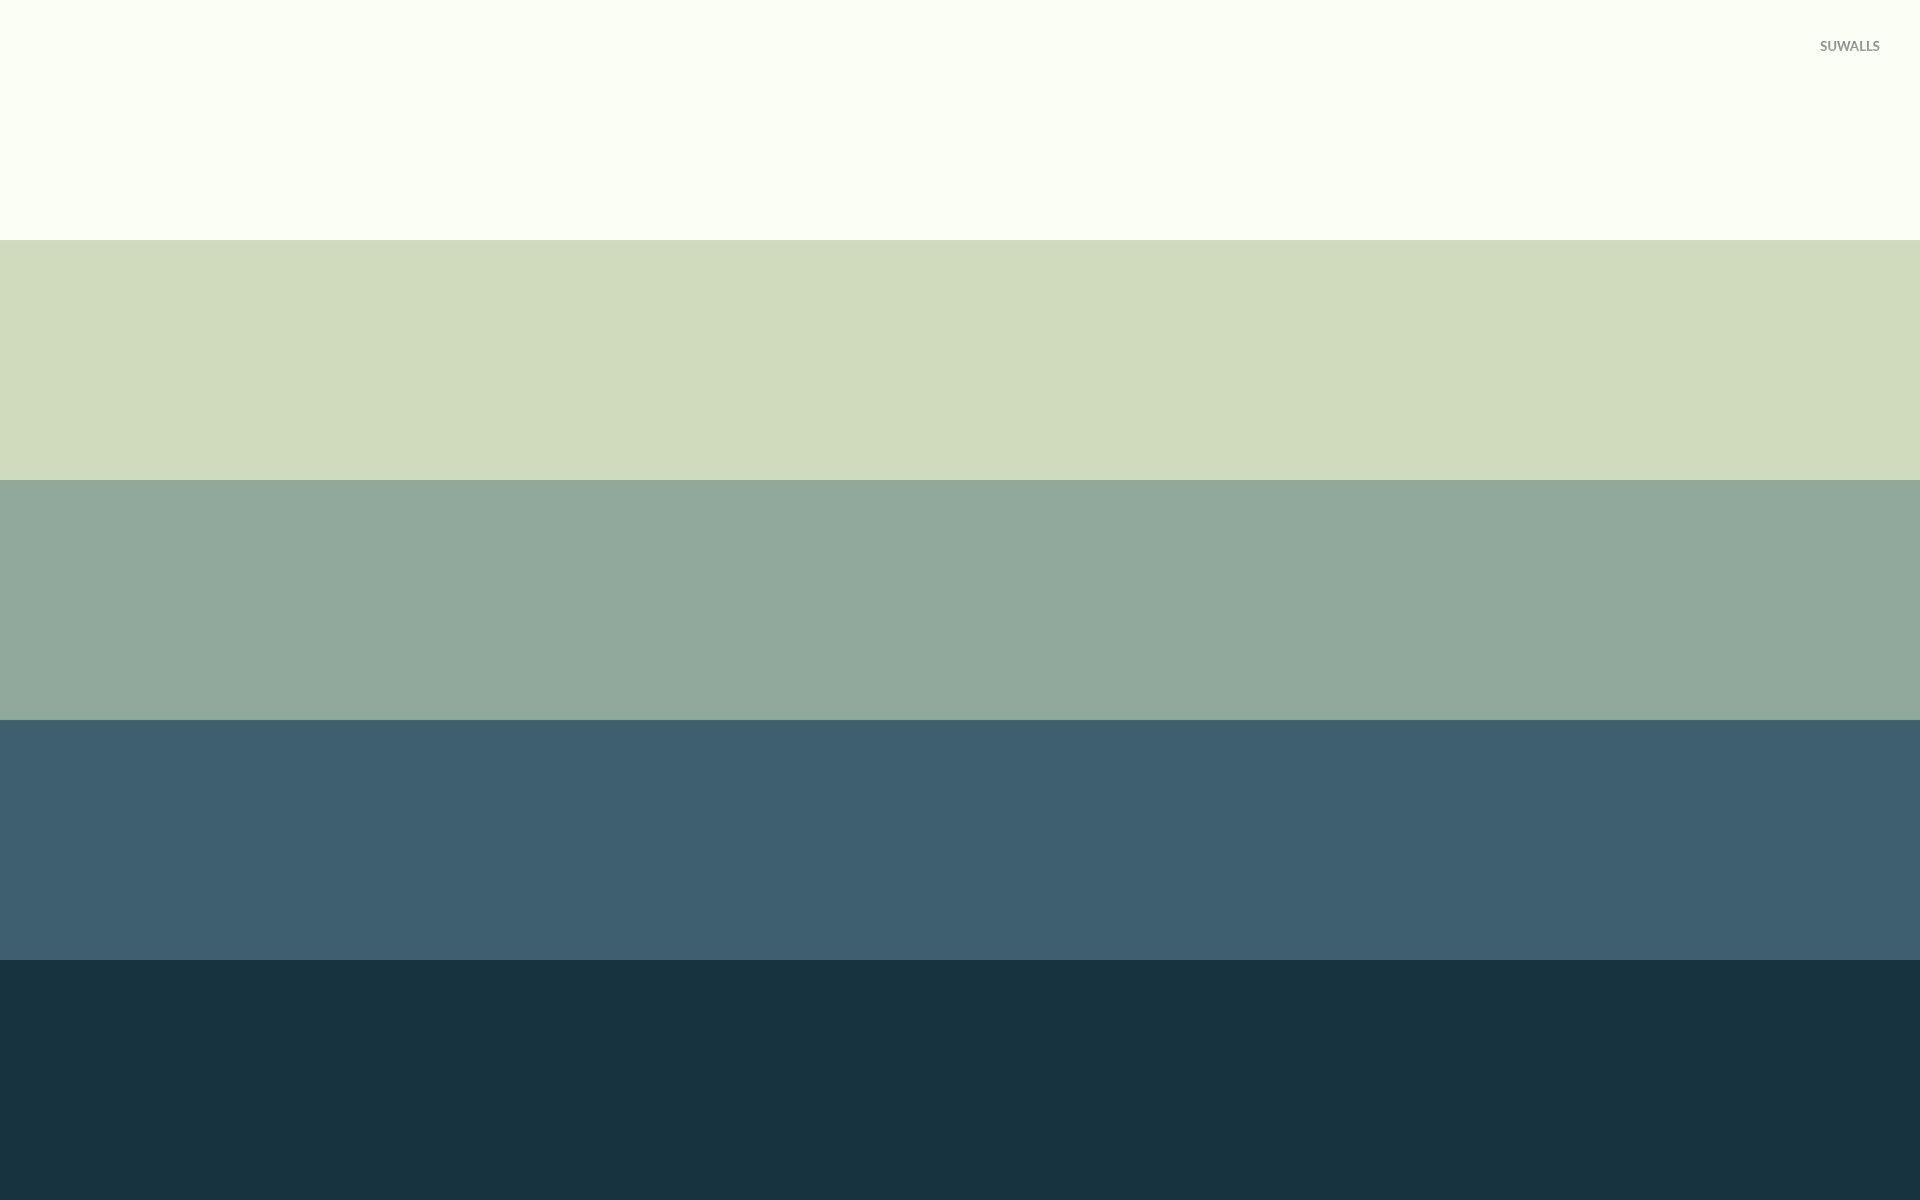 Fall Wallpaper For Desktop Free Blue Gradient Stripes Wallpaper Vector Wallpapers 26502